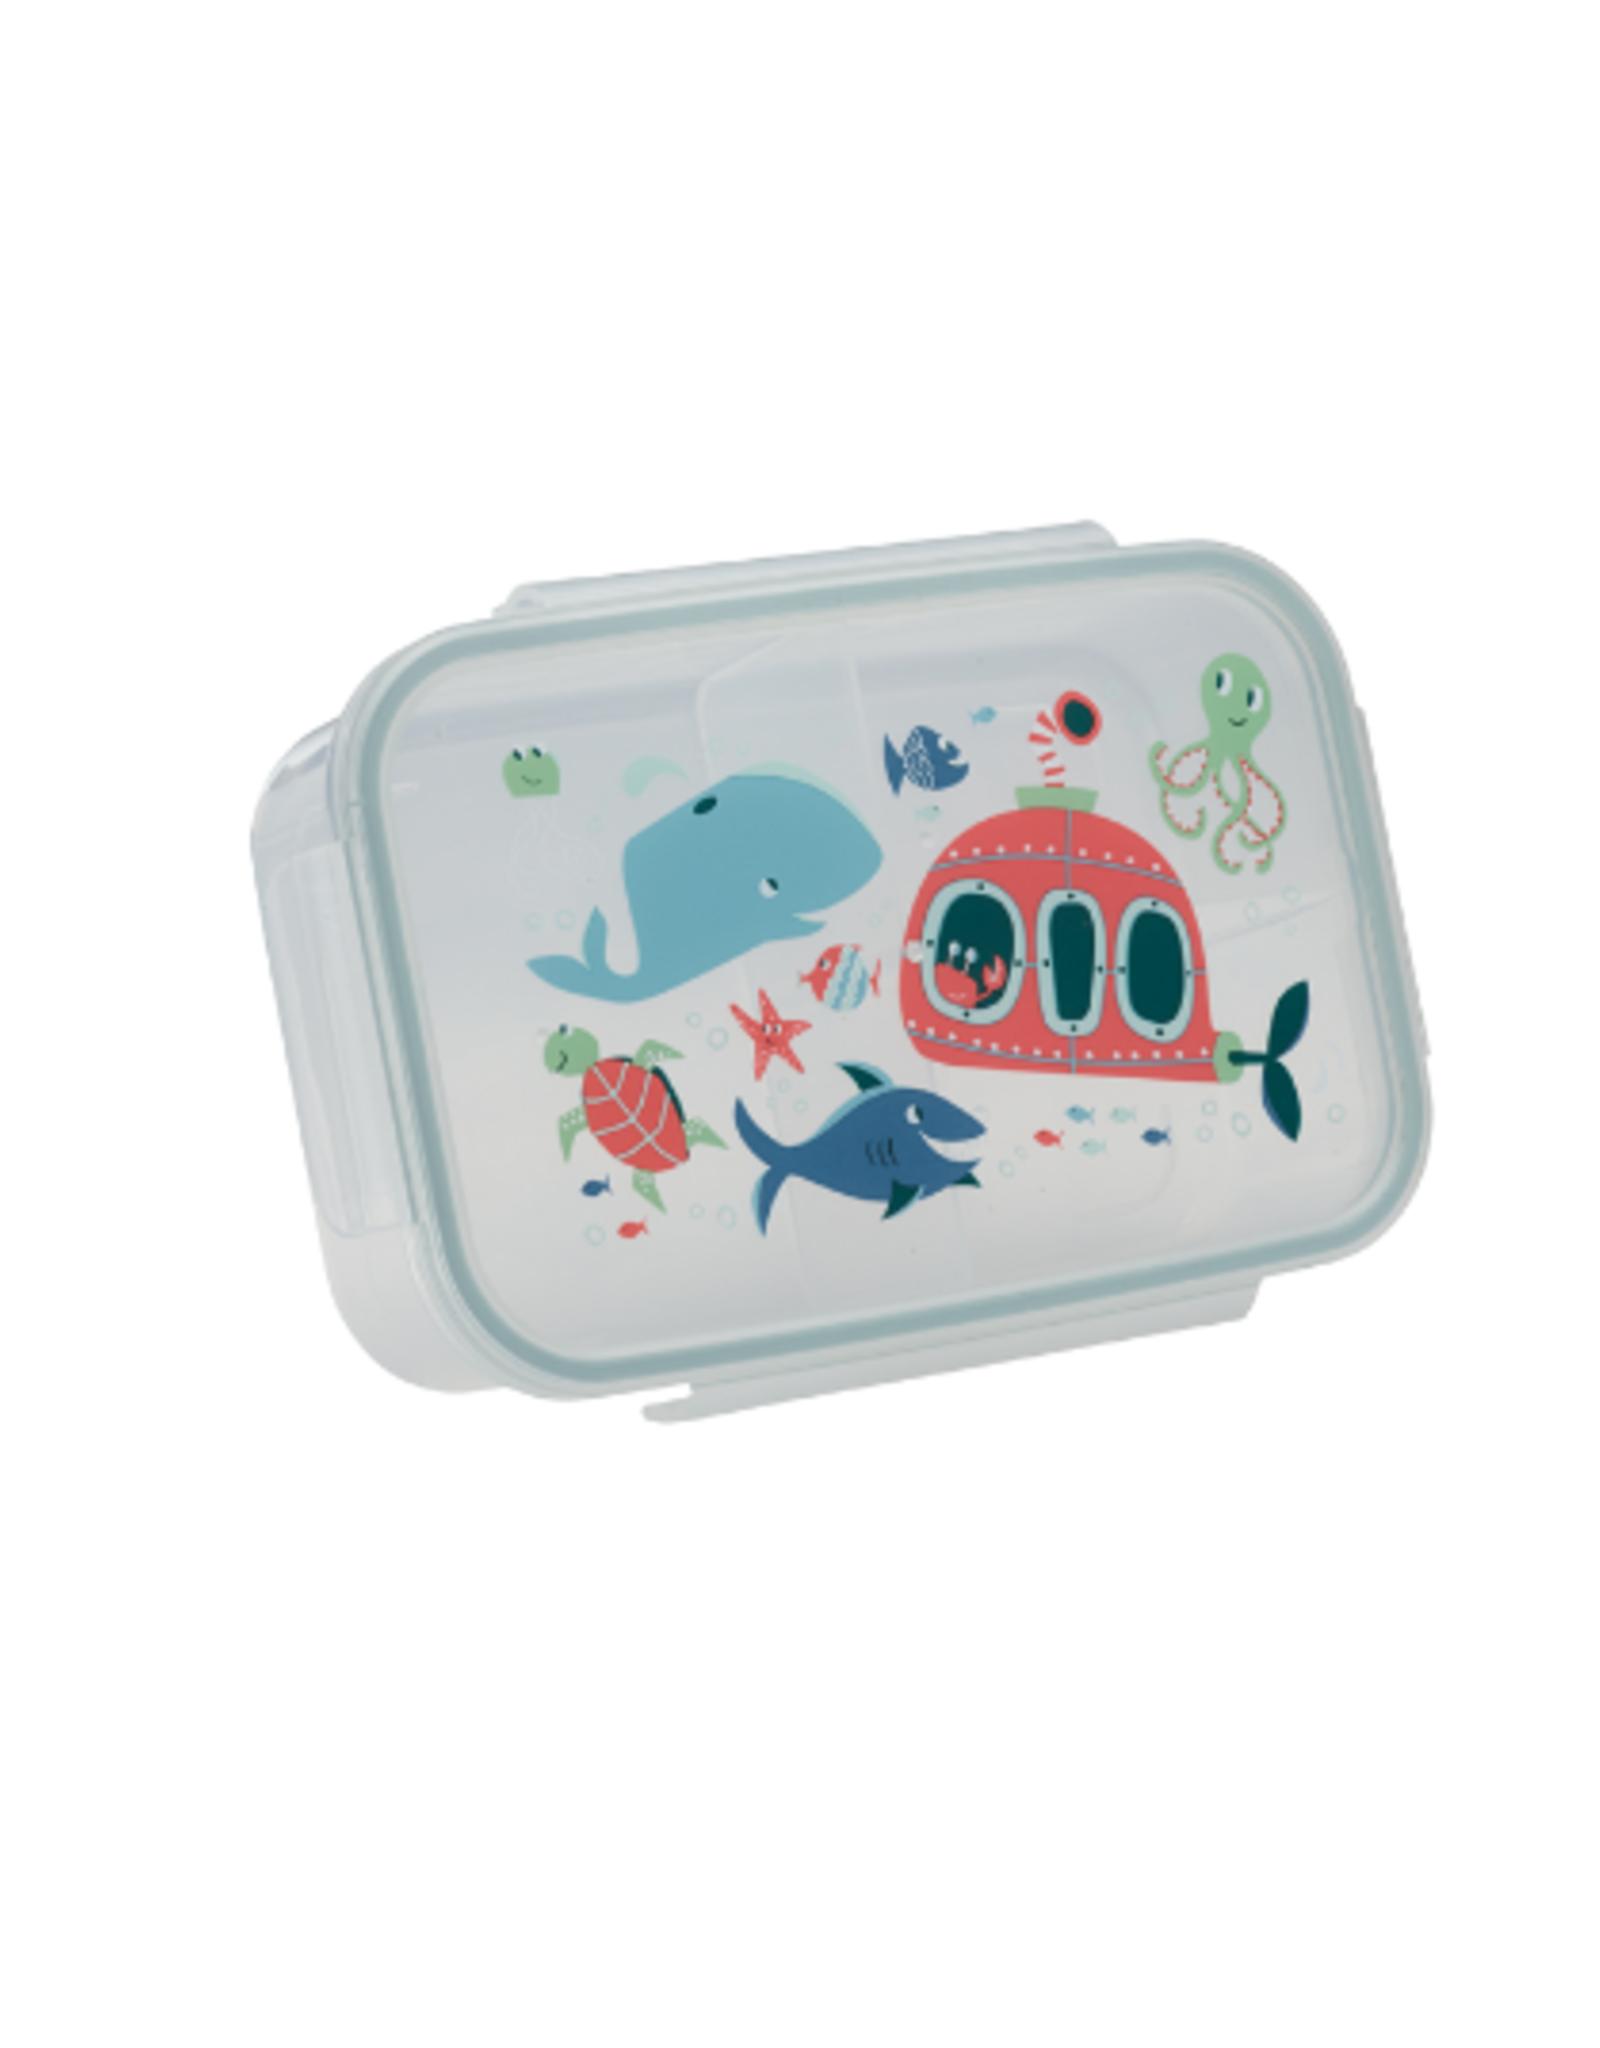 ORE Originals Bento Box, Ocean